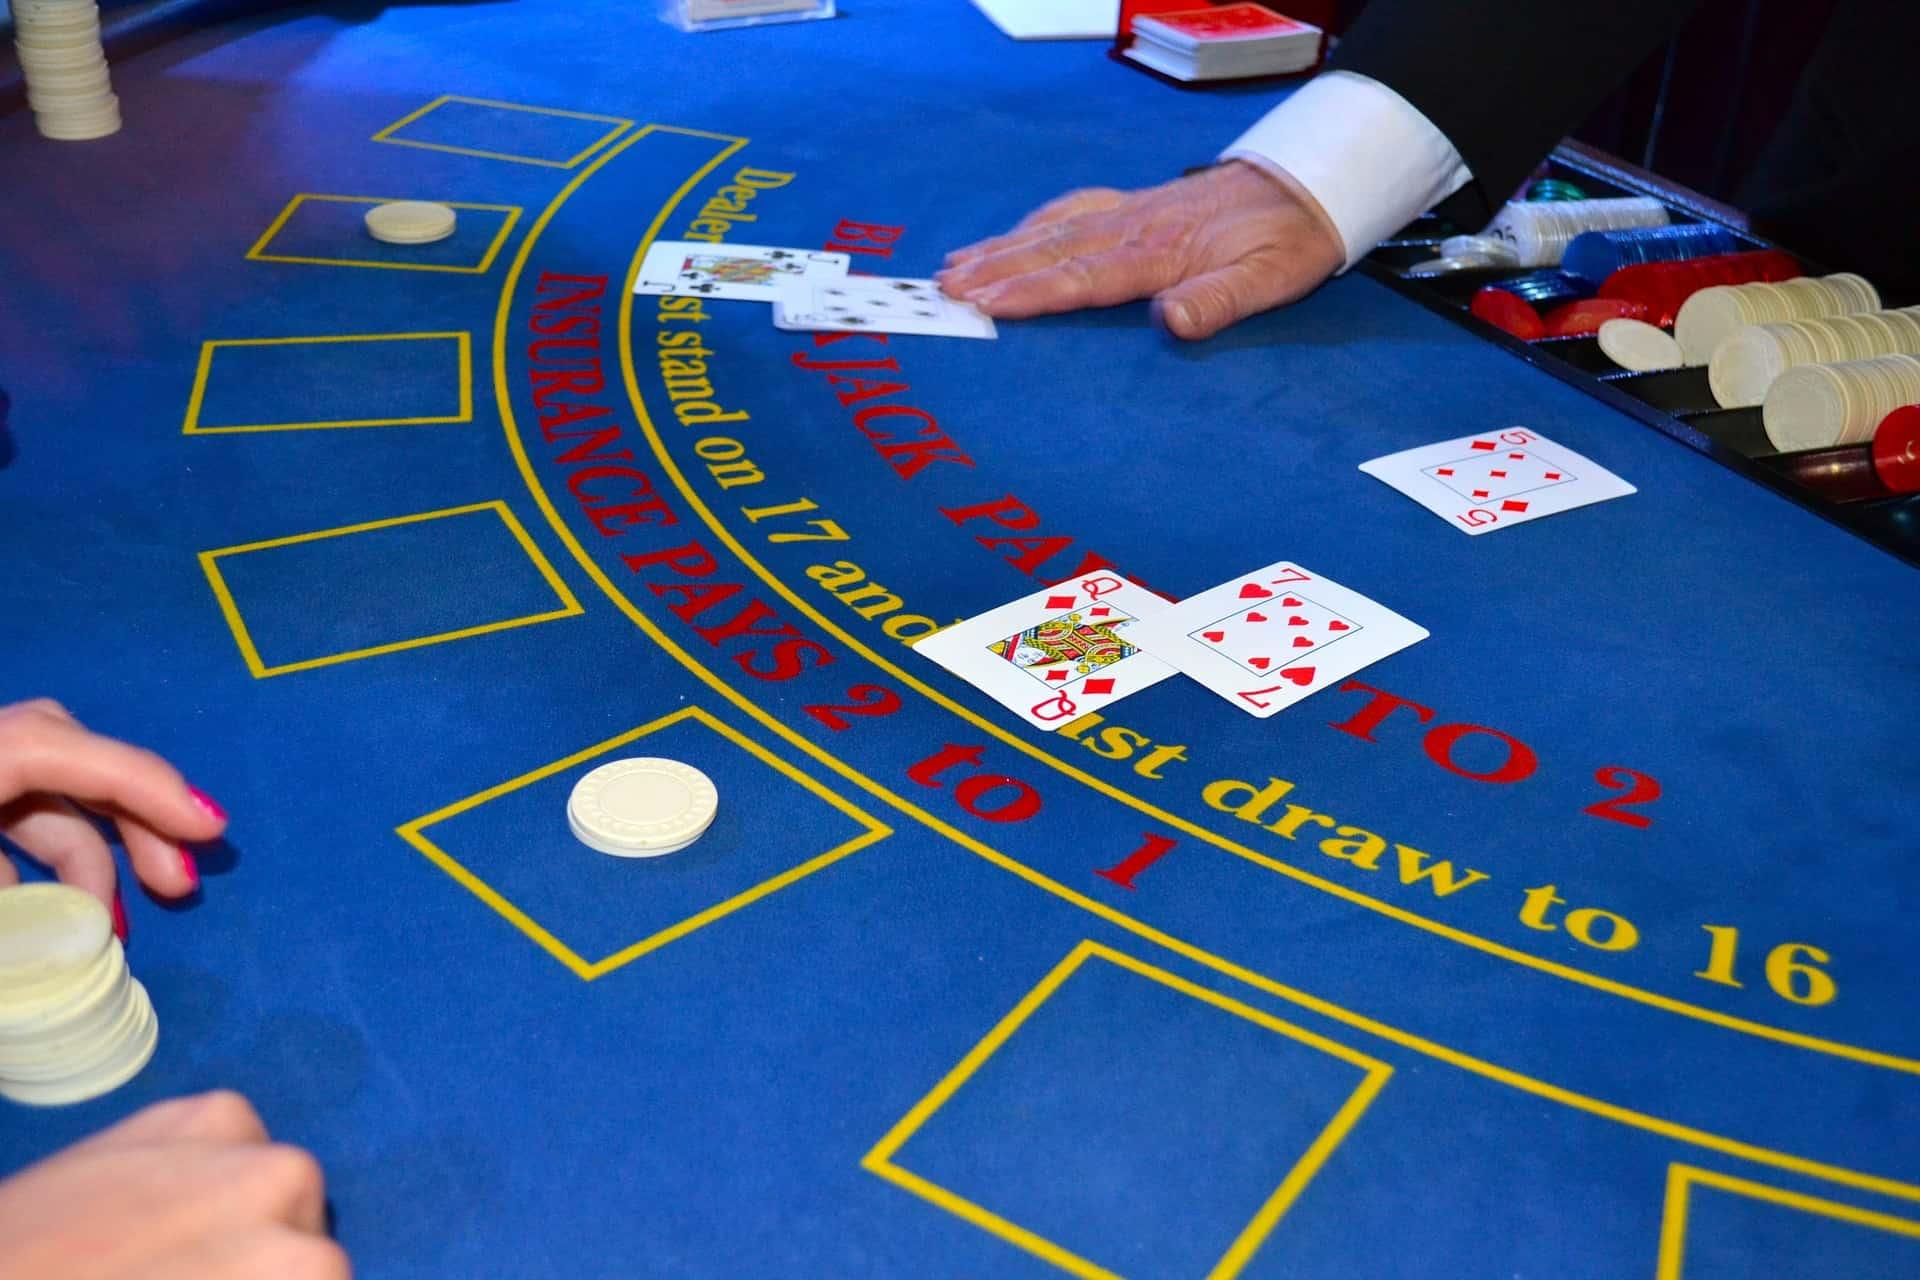 Blackjack spelregels en tips